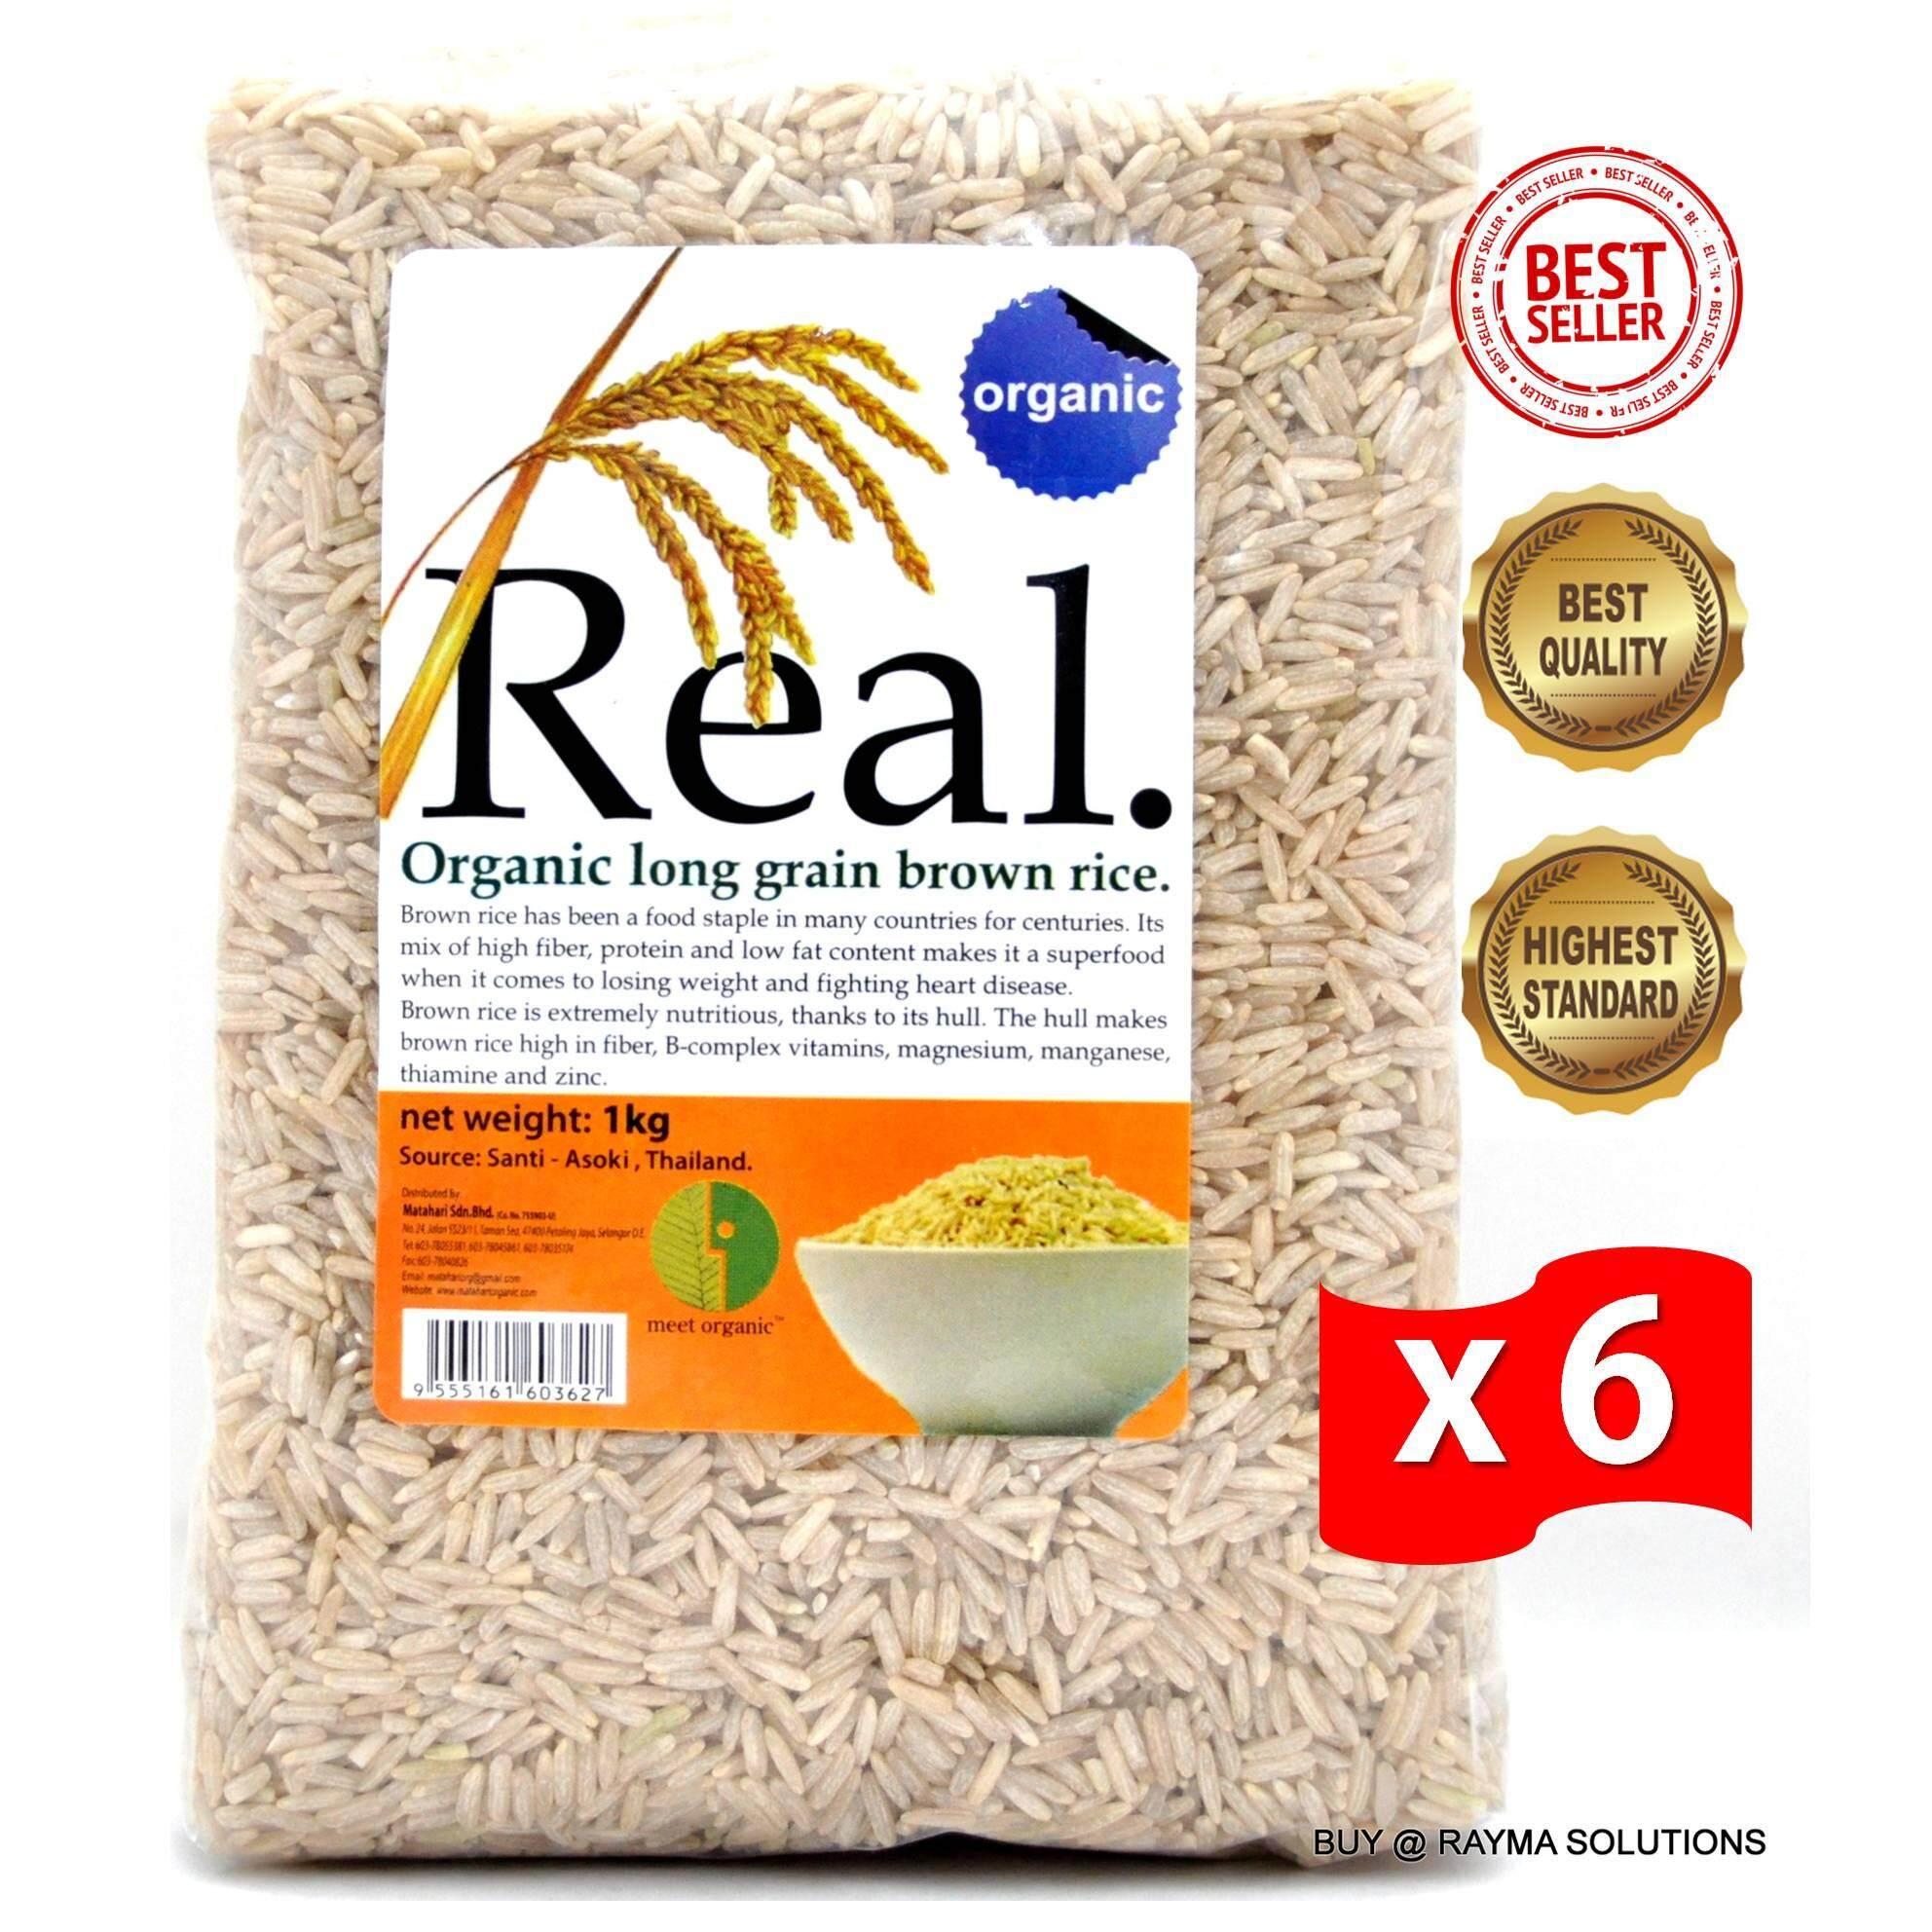 [ Best Deal ] REAL Organic Long Grain Brown Rice 1kg (6 Packs)